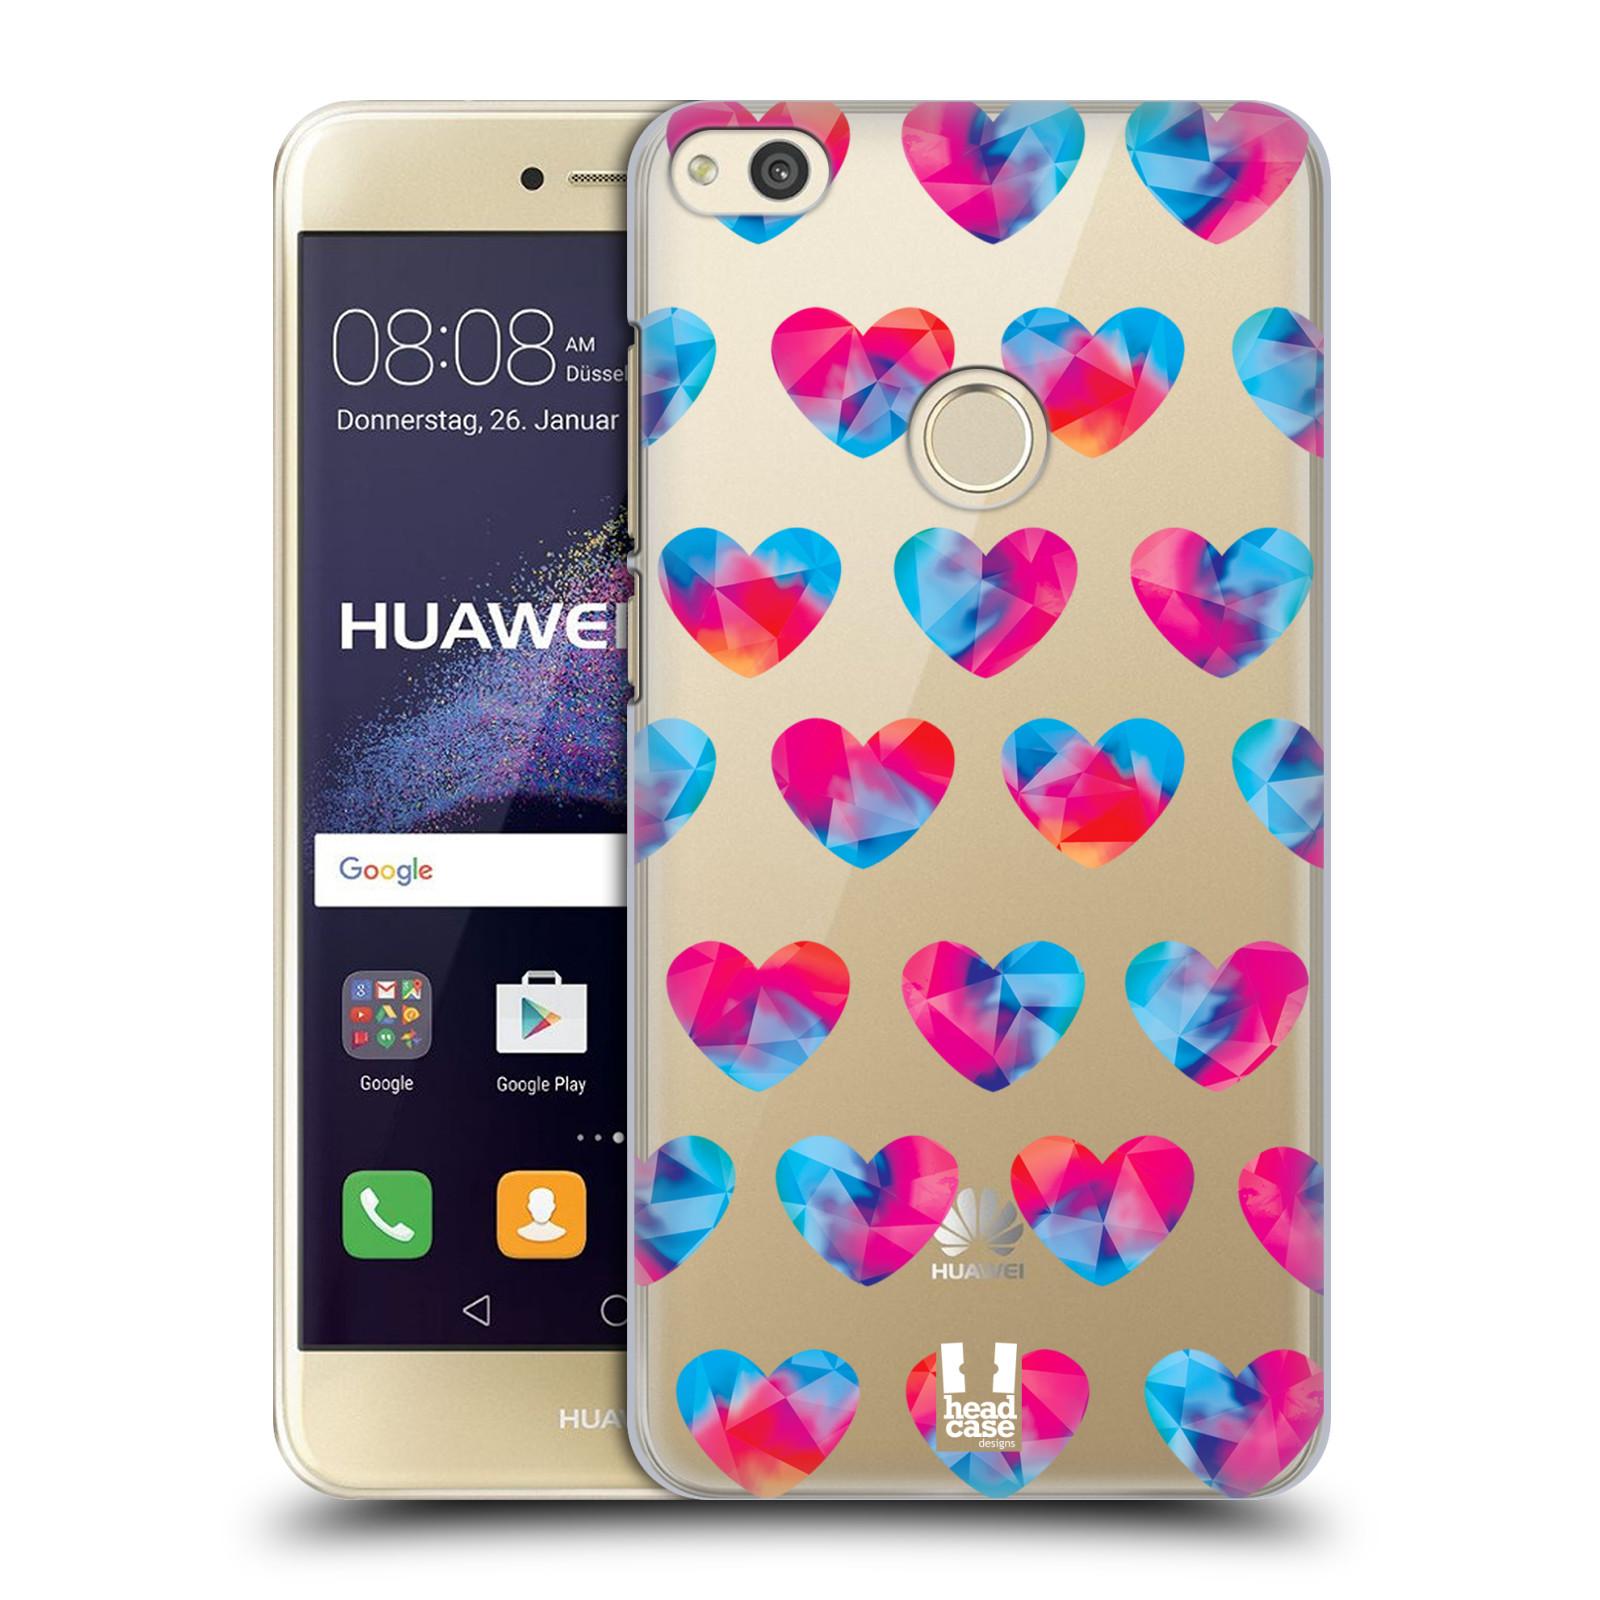 Plastové pouzdro na mobil Huawei P9 Lite (2017) - Head Case - Srdíčka hrající barvami